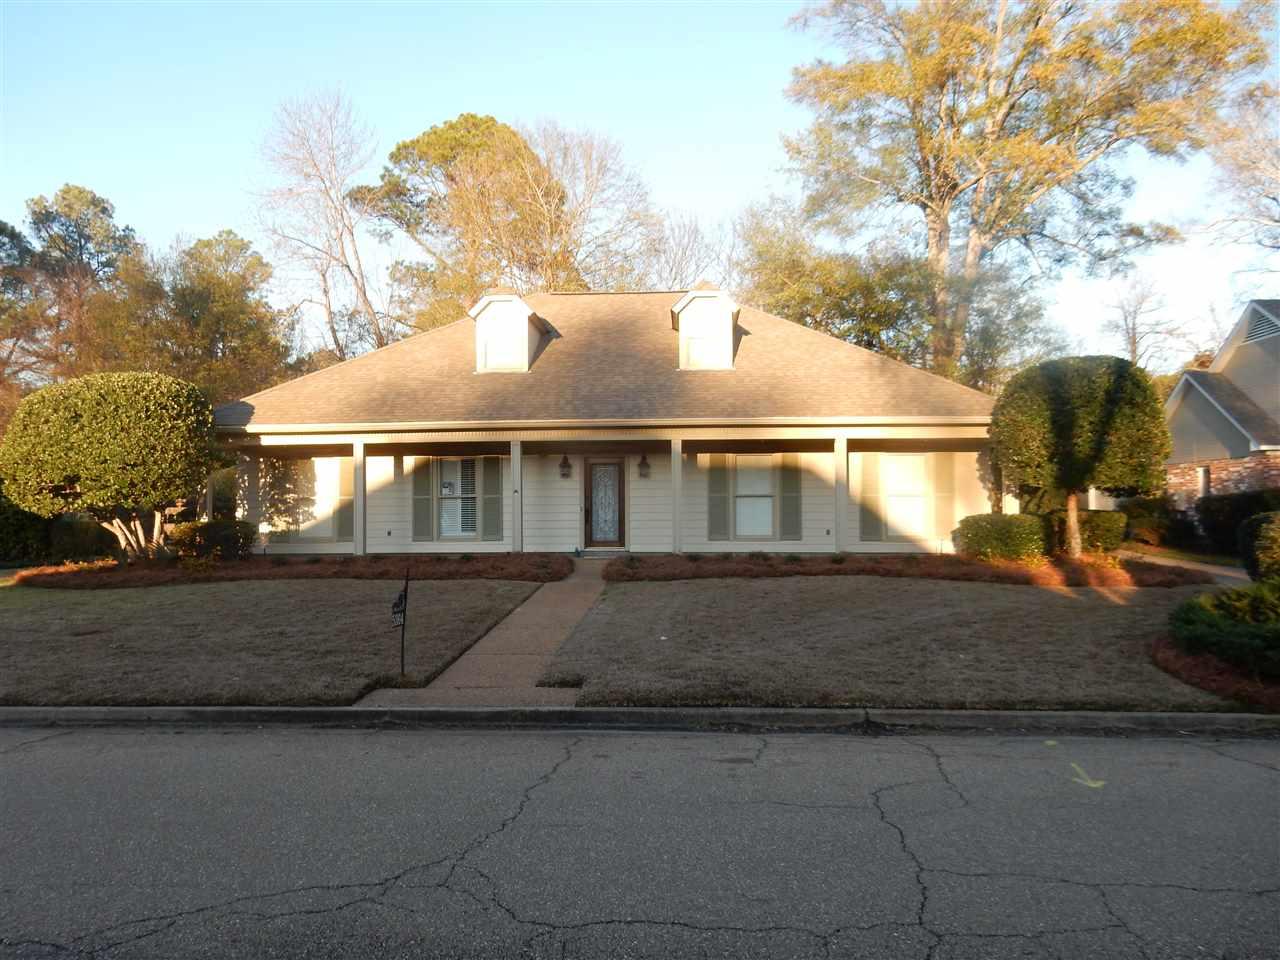 Rental Homes for Rent, ListingId:36155174, location: 5364 FAIRWAY ST Jackson 39211